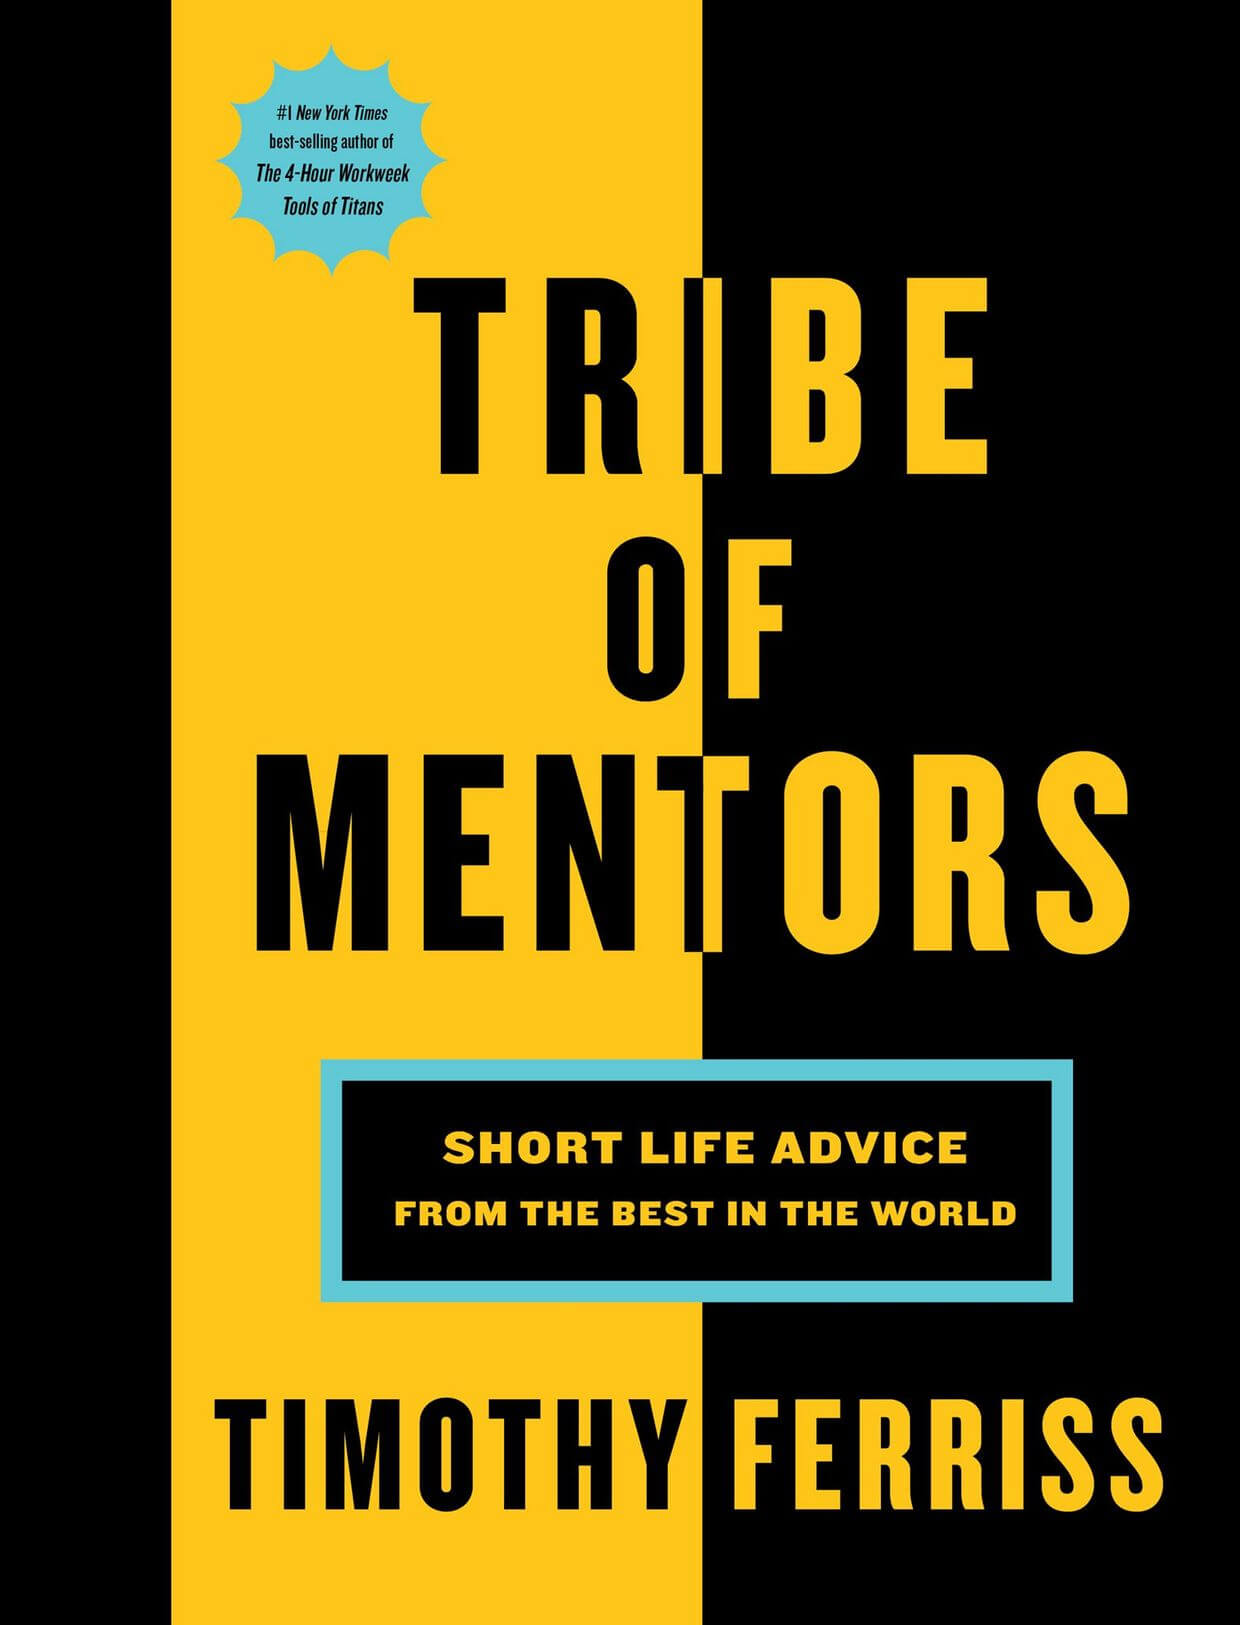 Tribu de Mentores - Tim Ferriss